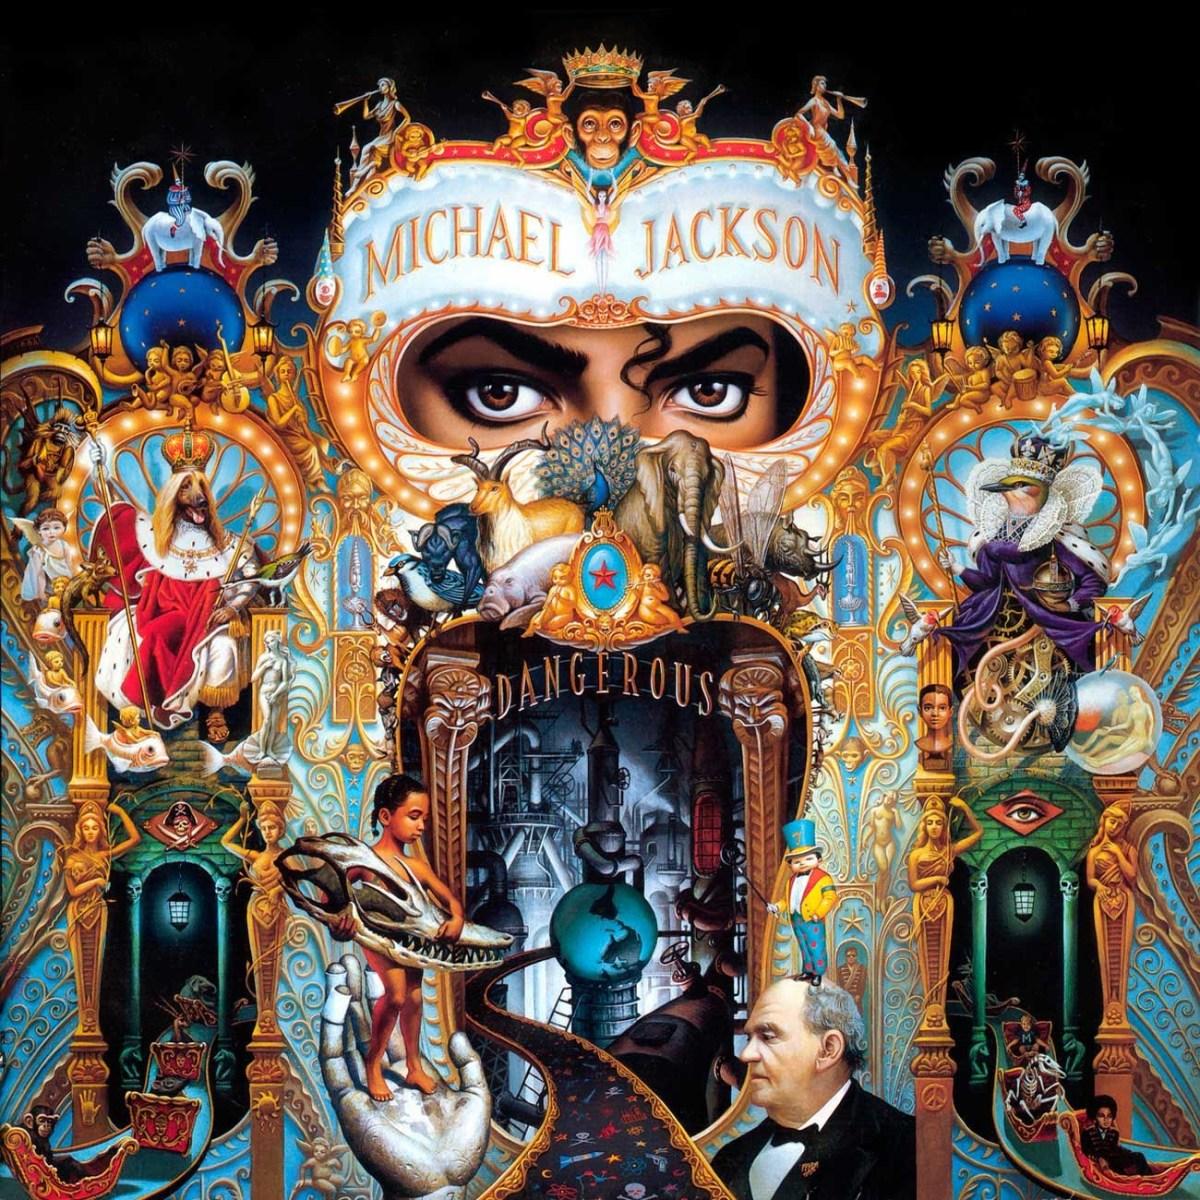 Michael Jackson – Dangerous (1991)